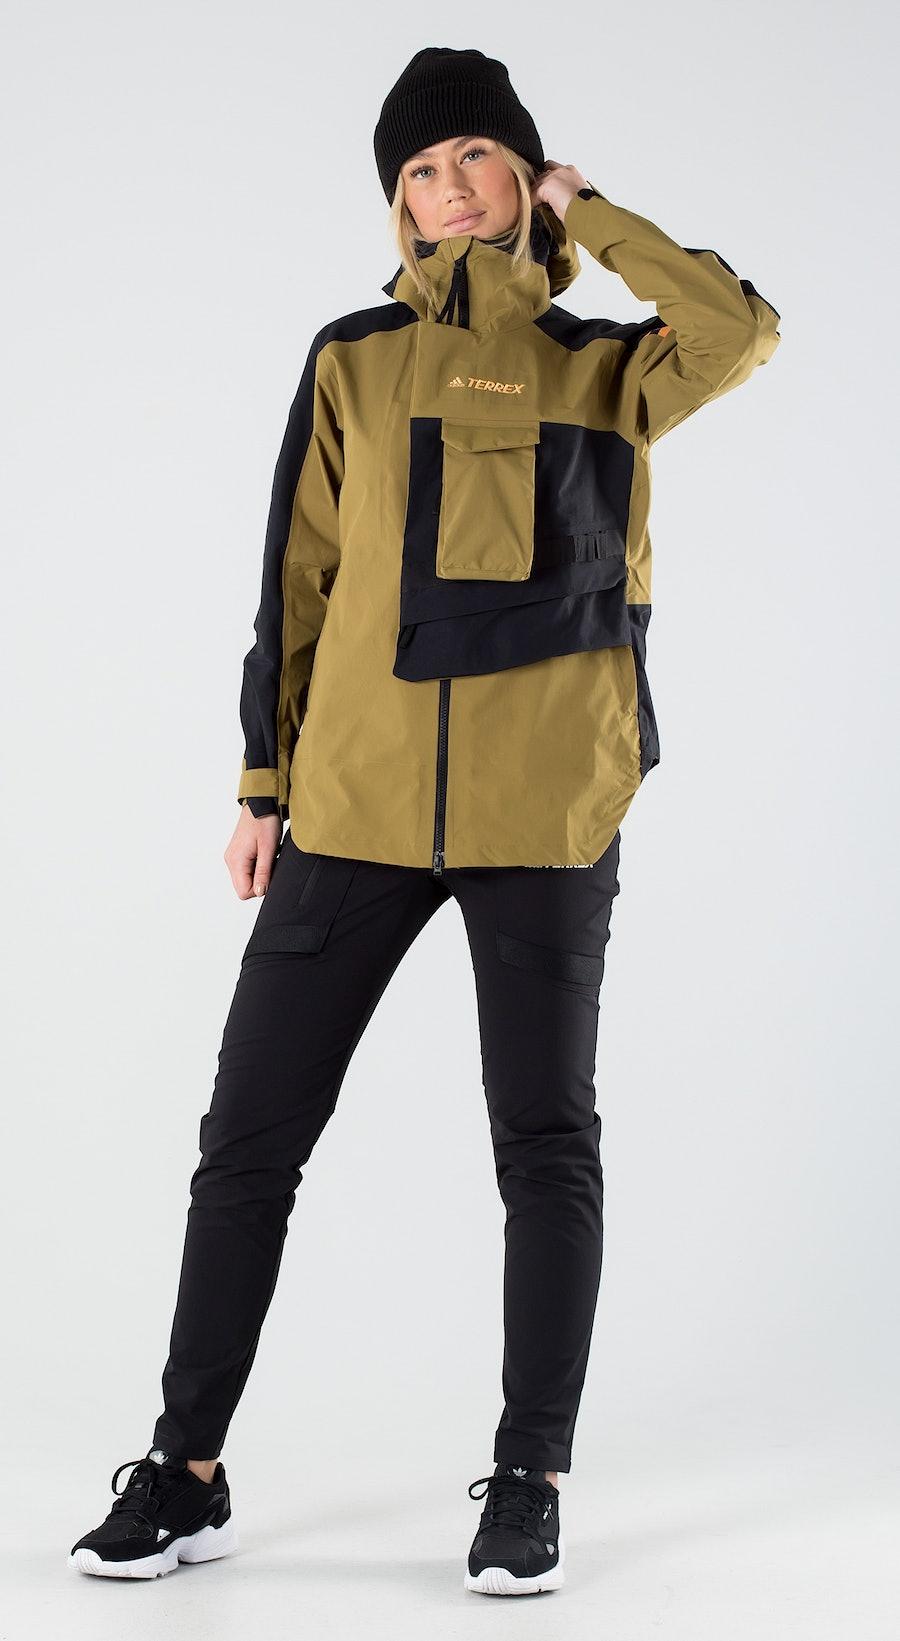 Adidas Terrex Xploric Wild Moss/Black Outfit Multi